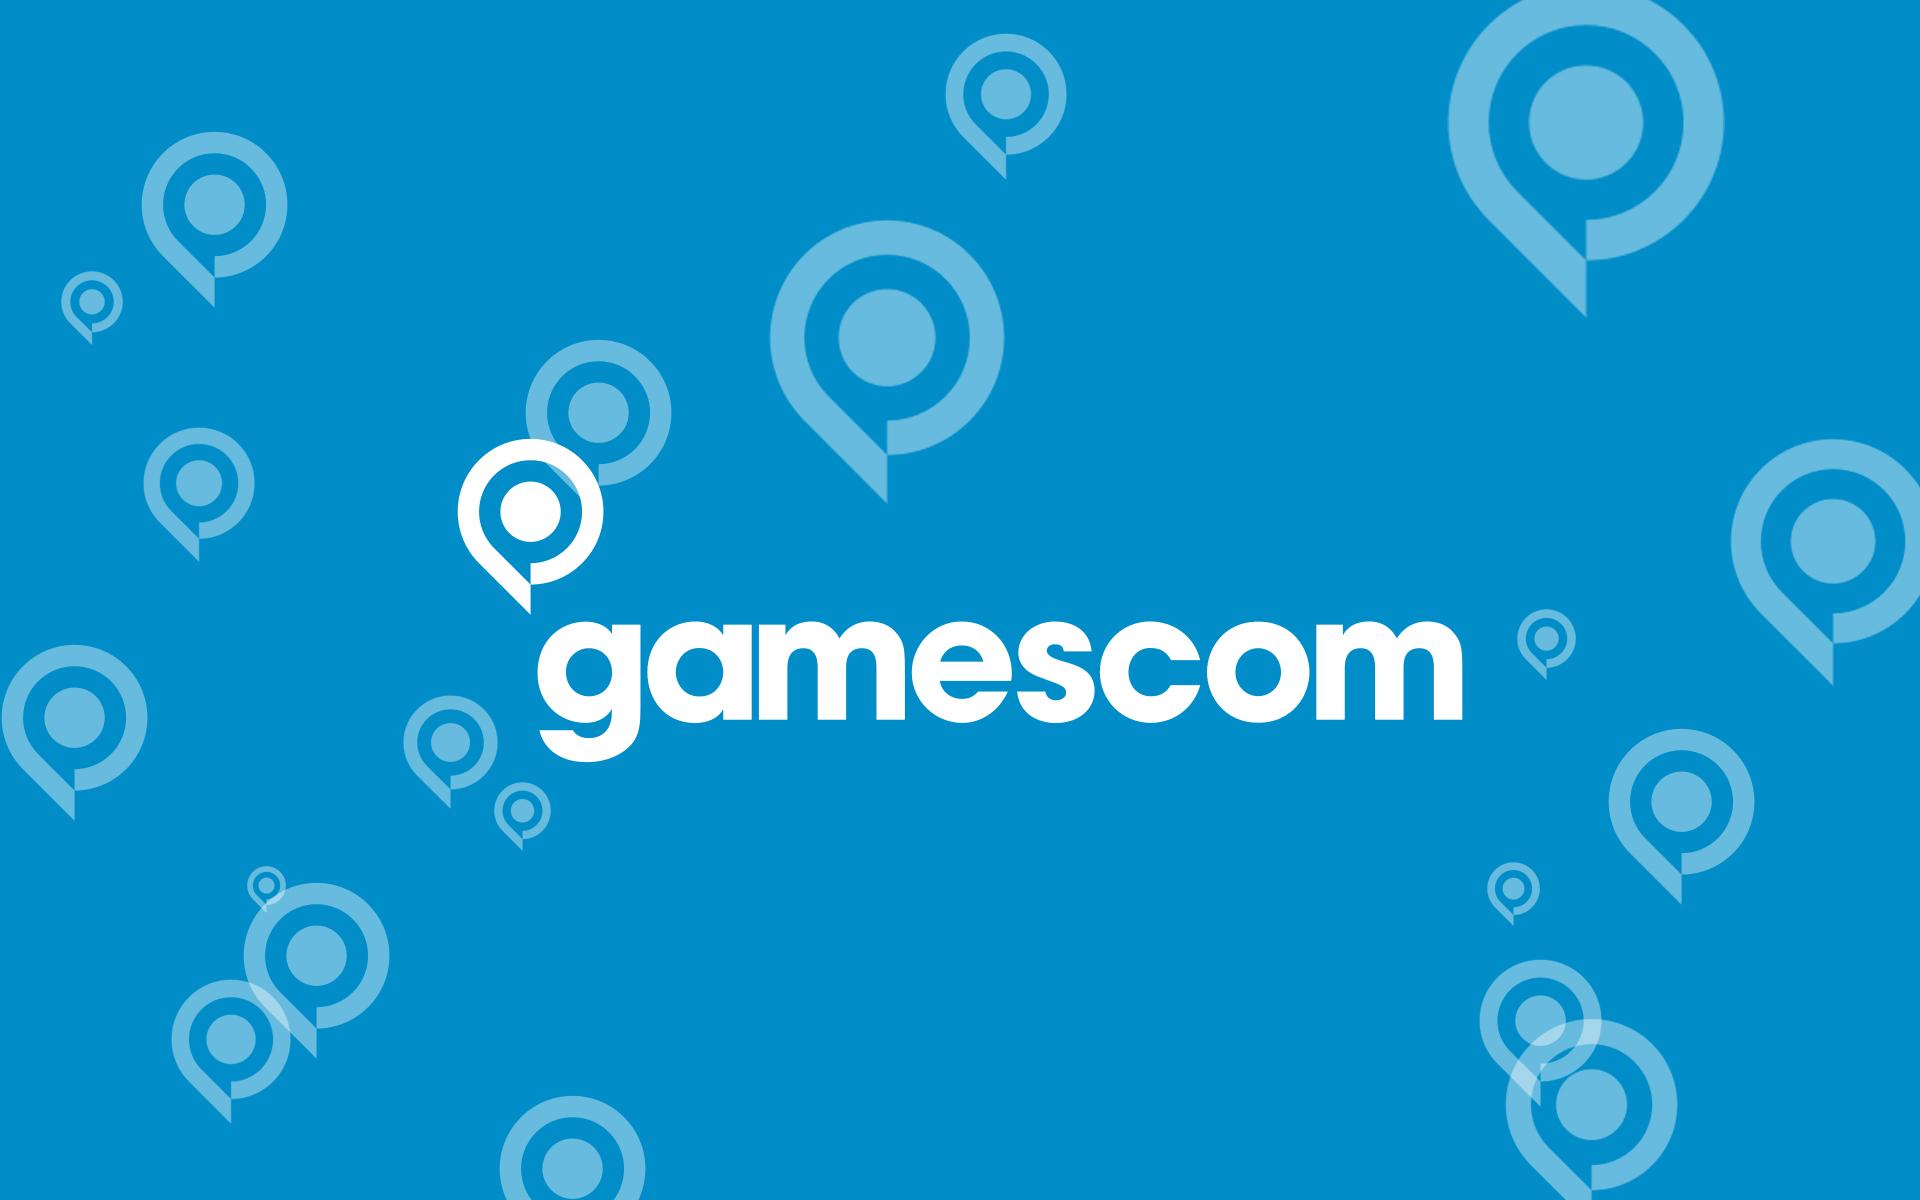 gamescom-wallpaper